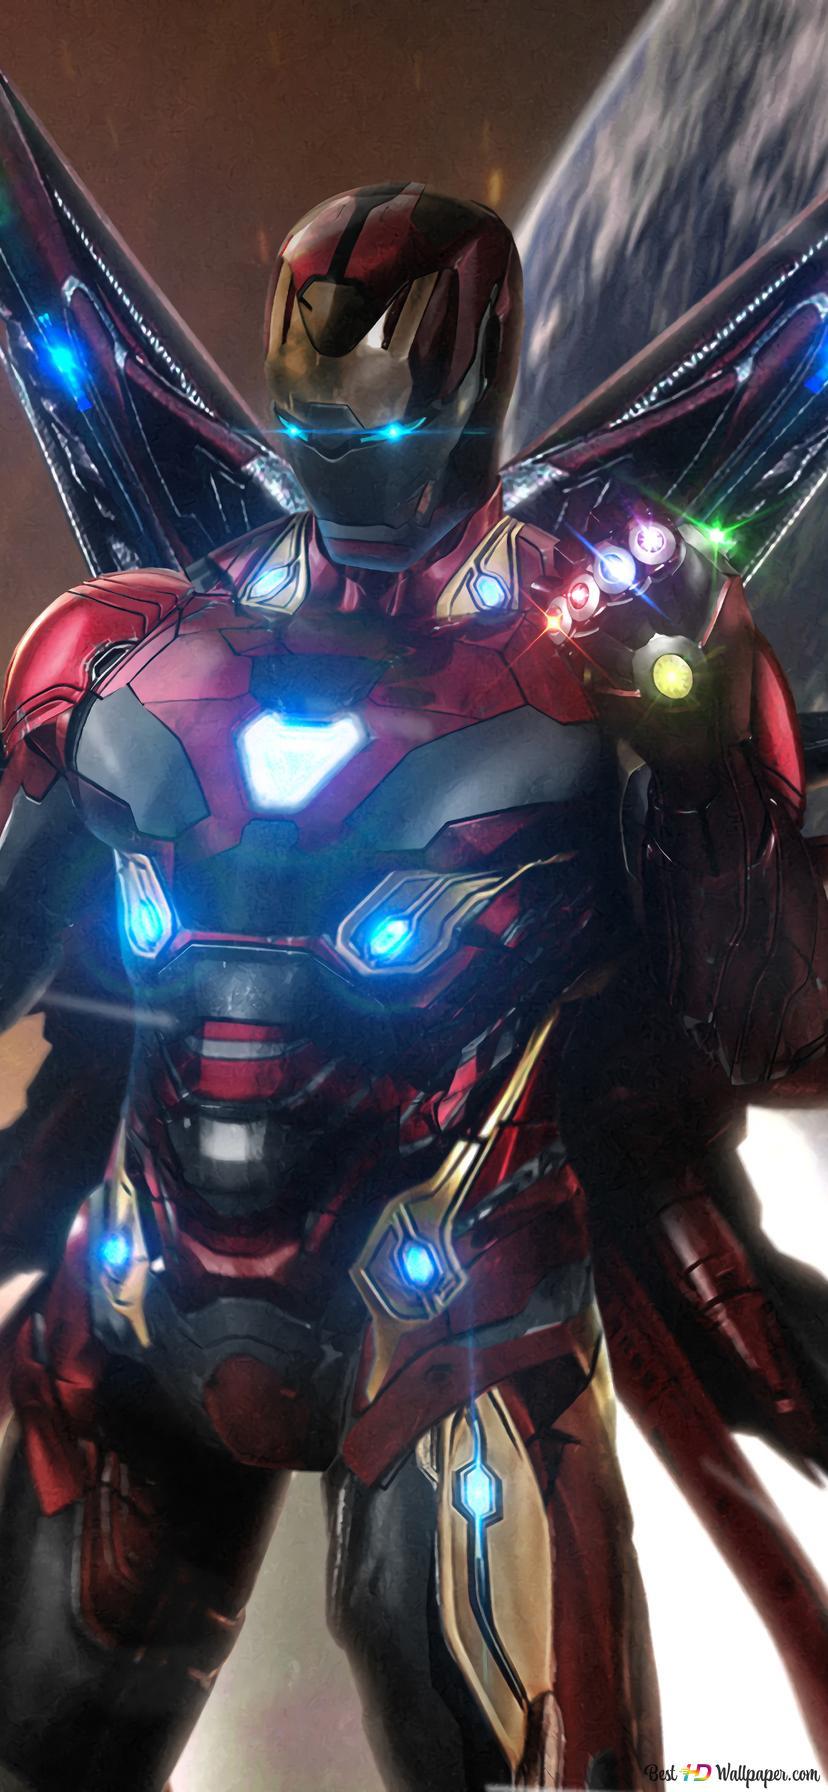 Avengers Endgame Iron Man Infinity Stones Unduhan Wallpaper Hd